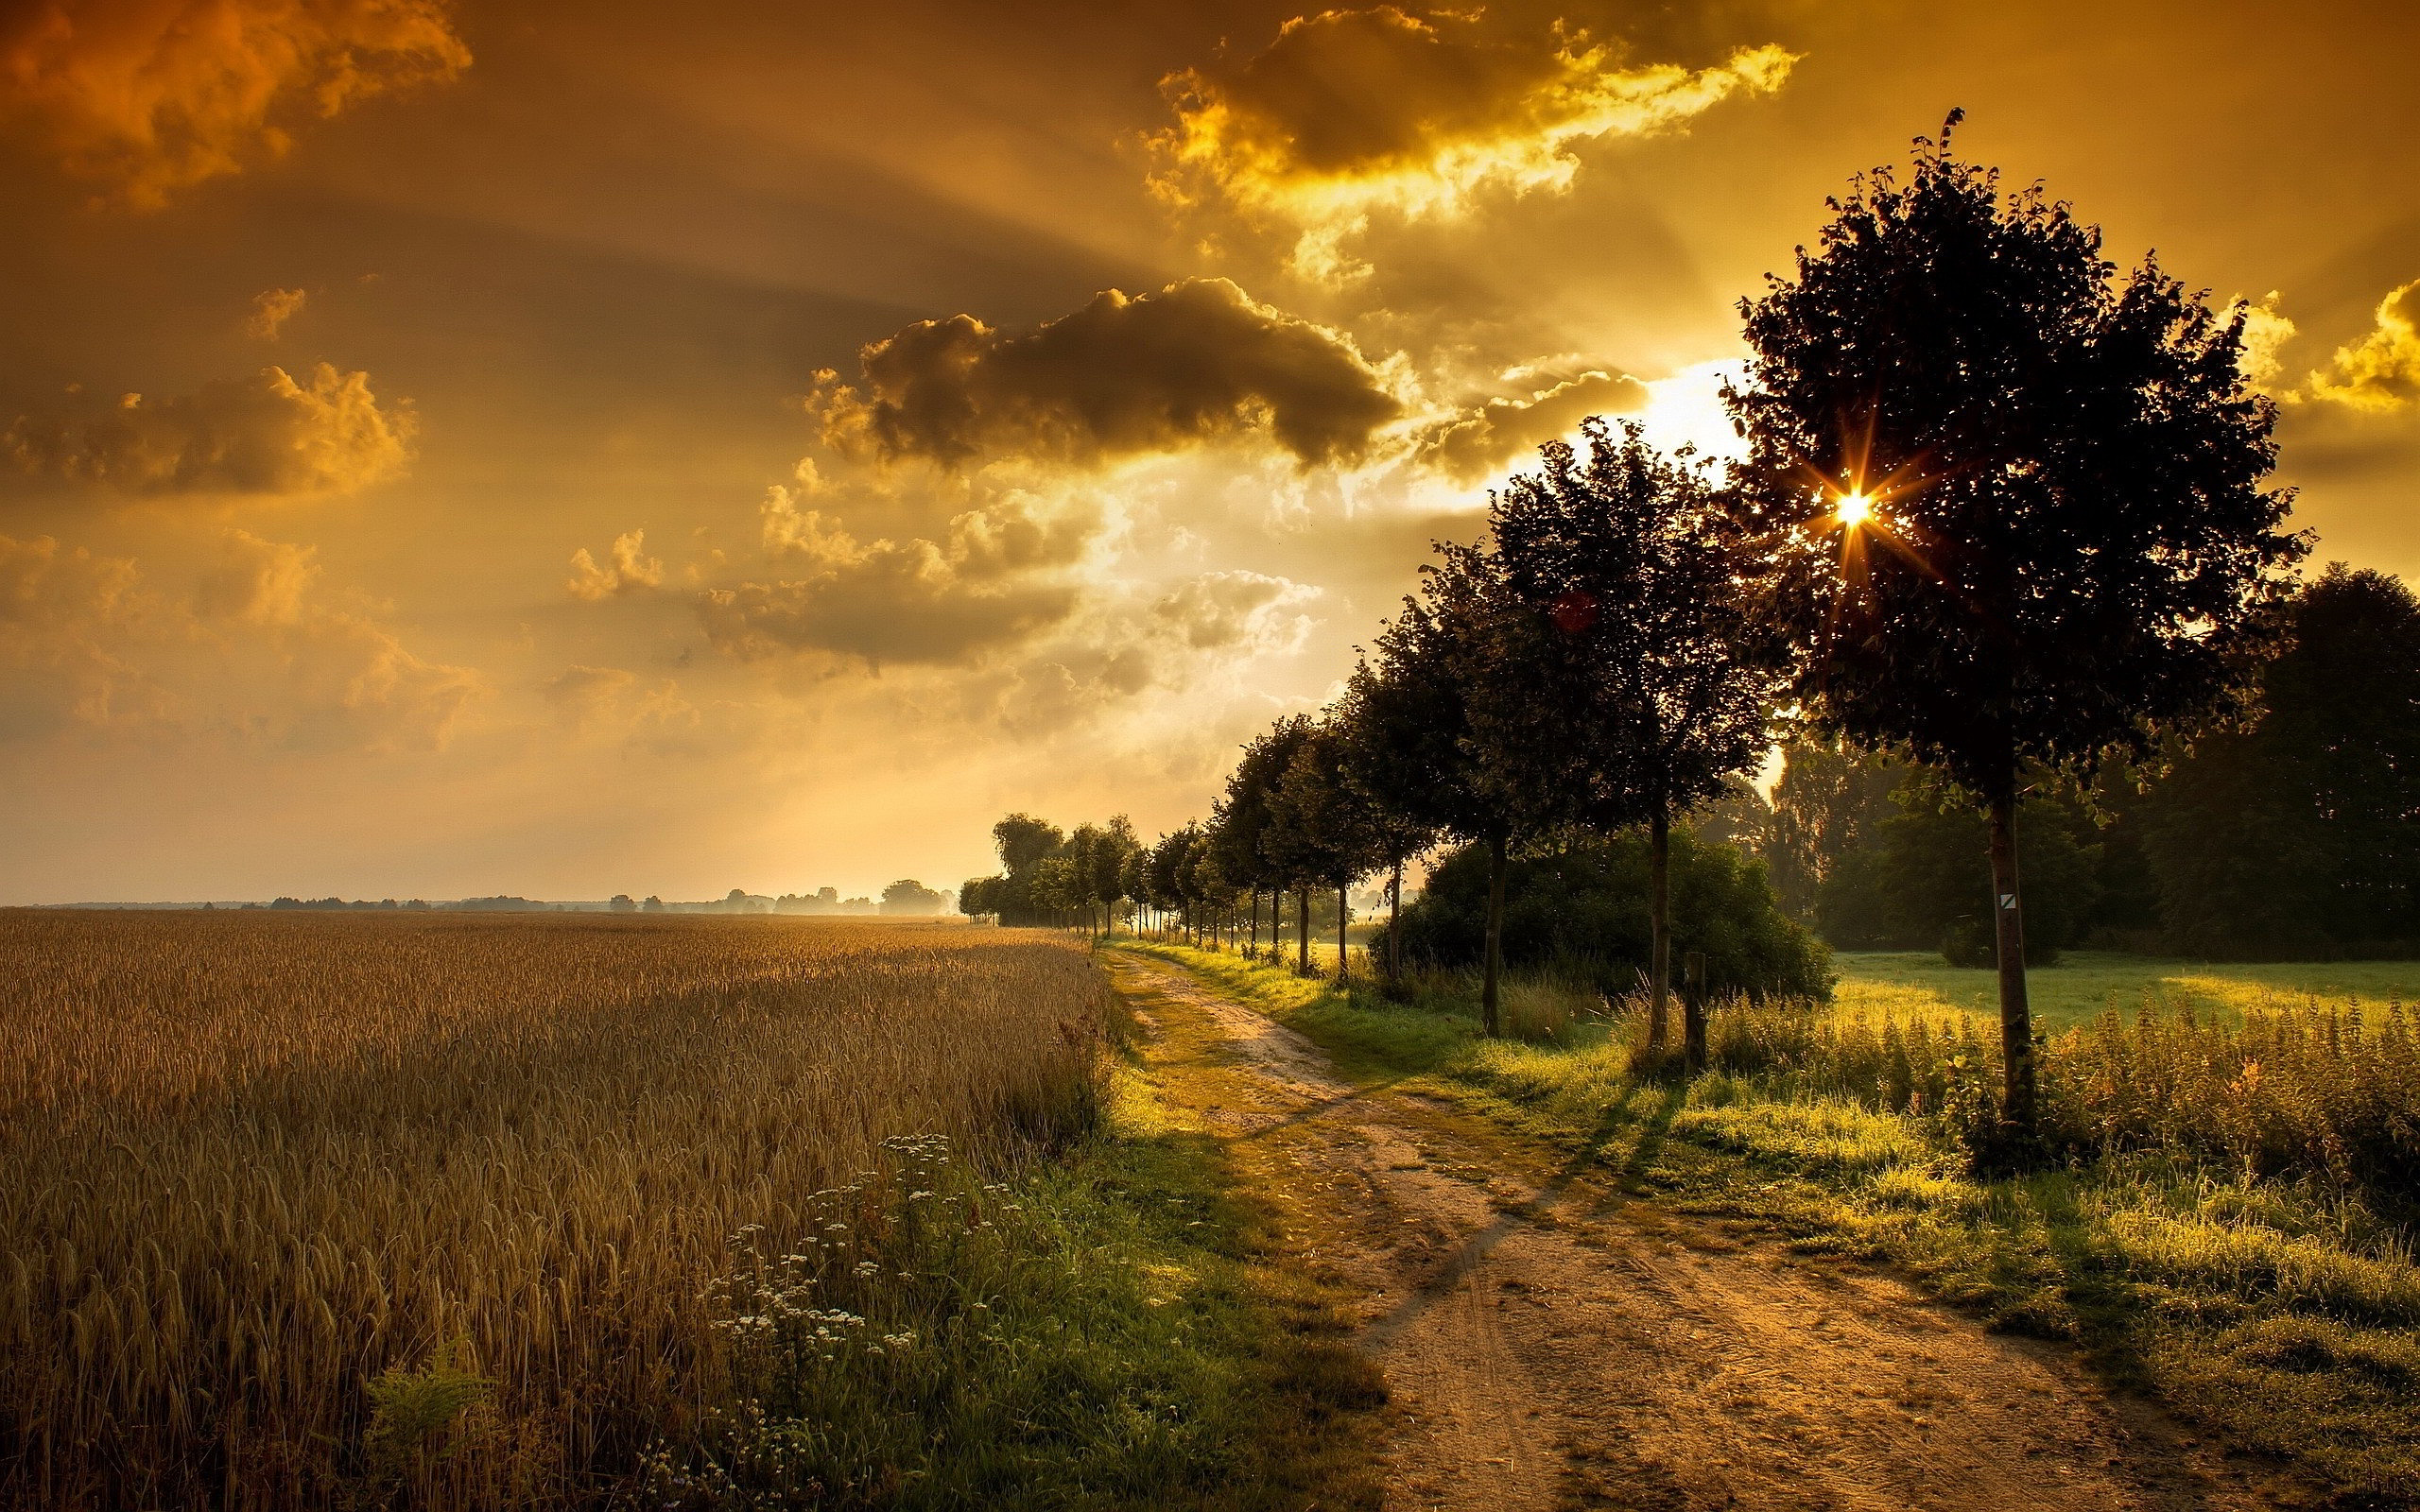 sunset images scenery hd hd desktop wallpapers 4k hd